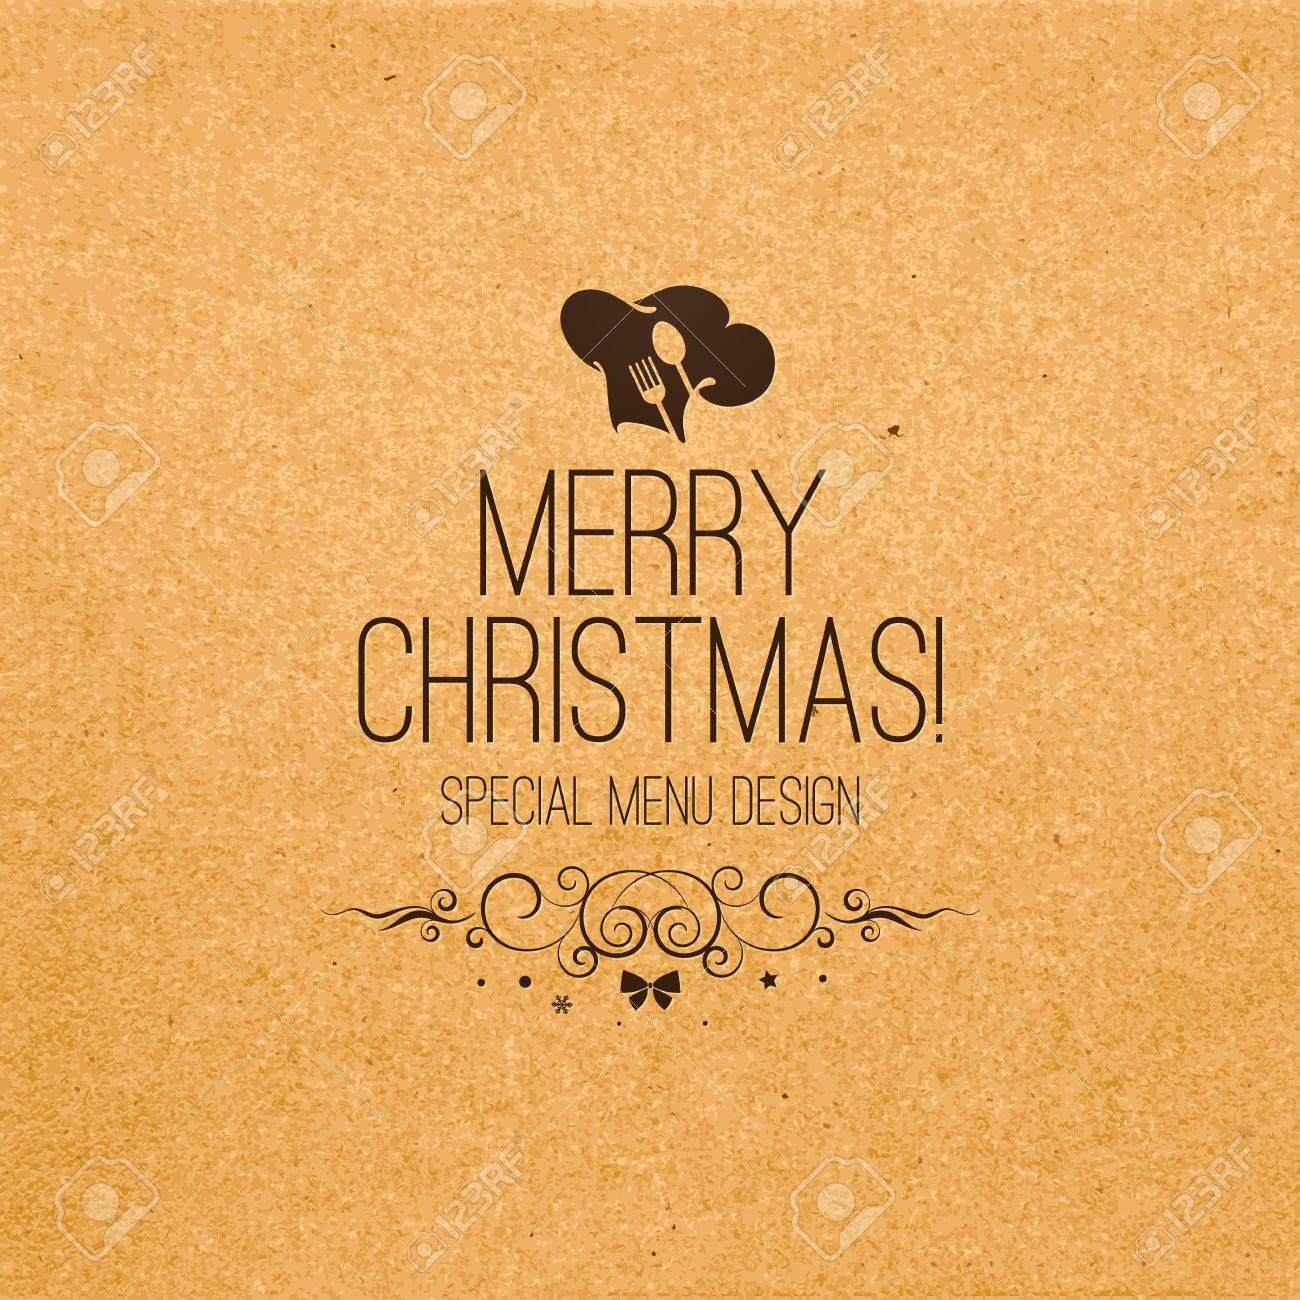 special christmas restaurant menu design royalty free cliparts